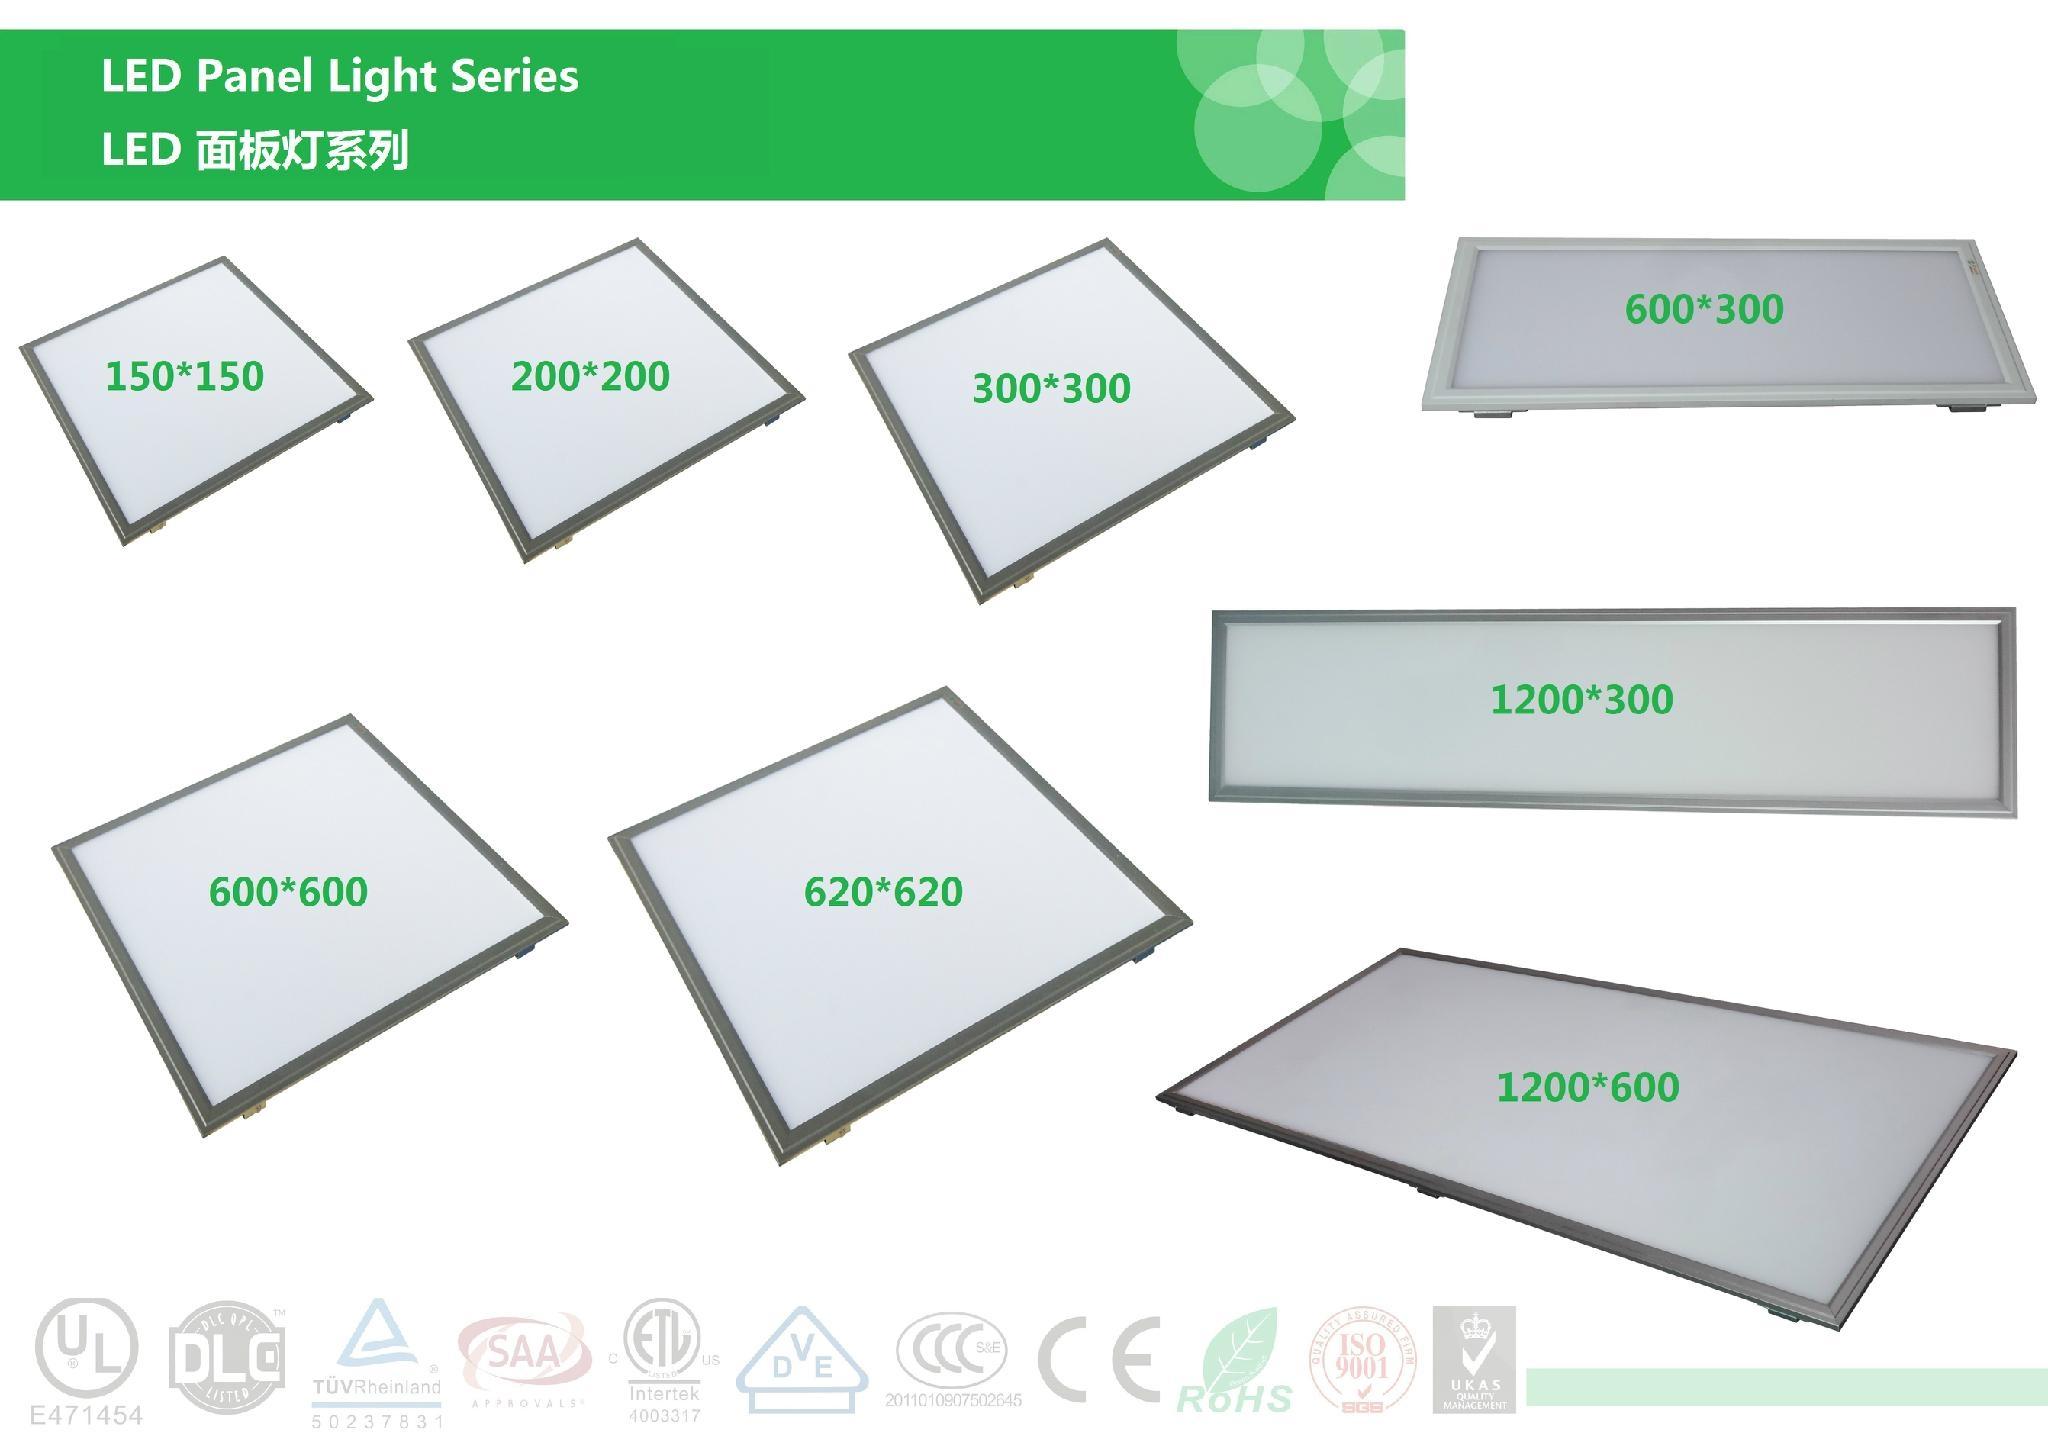 LED平板燈 24W-30W-45W-60W 600*600mm 7